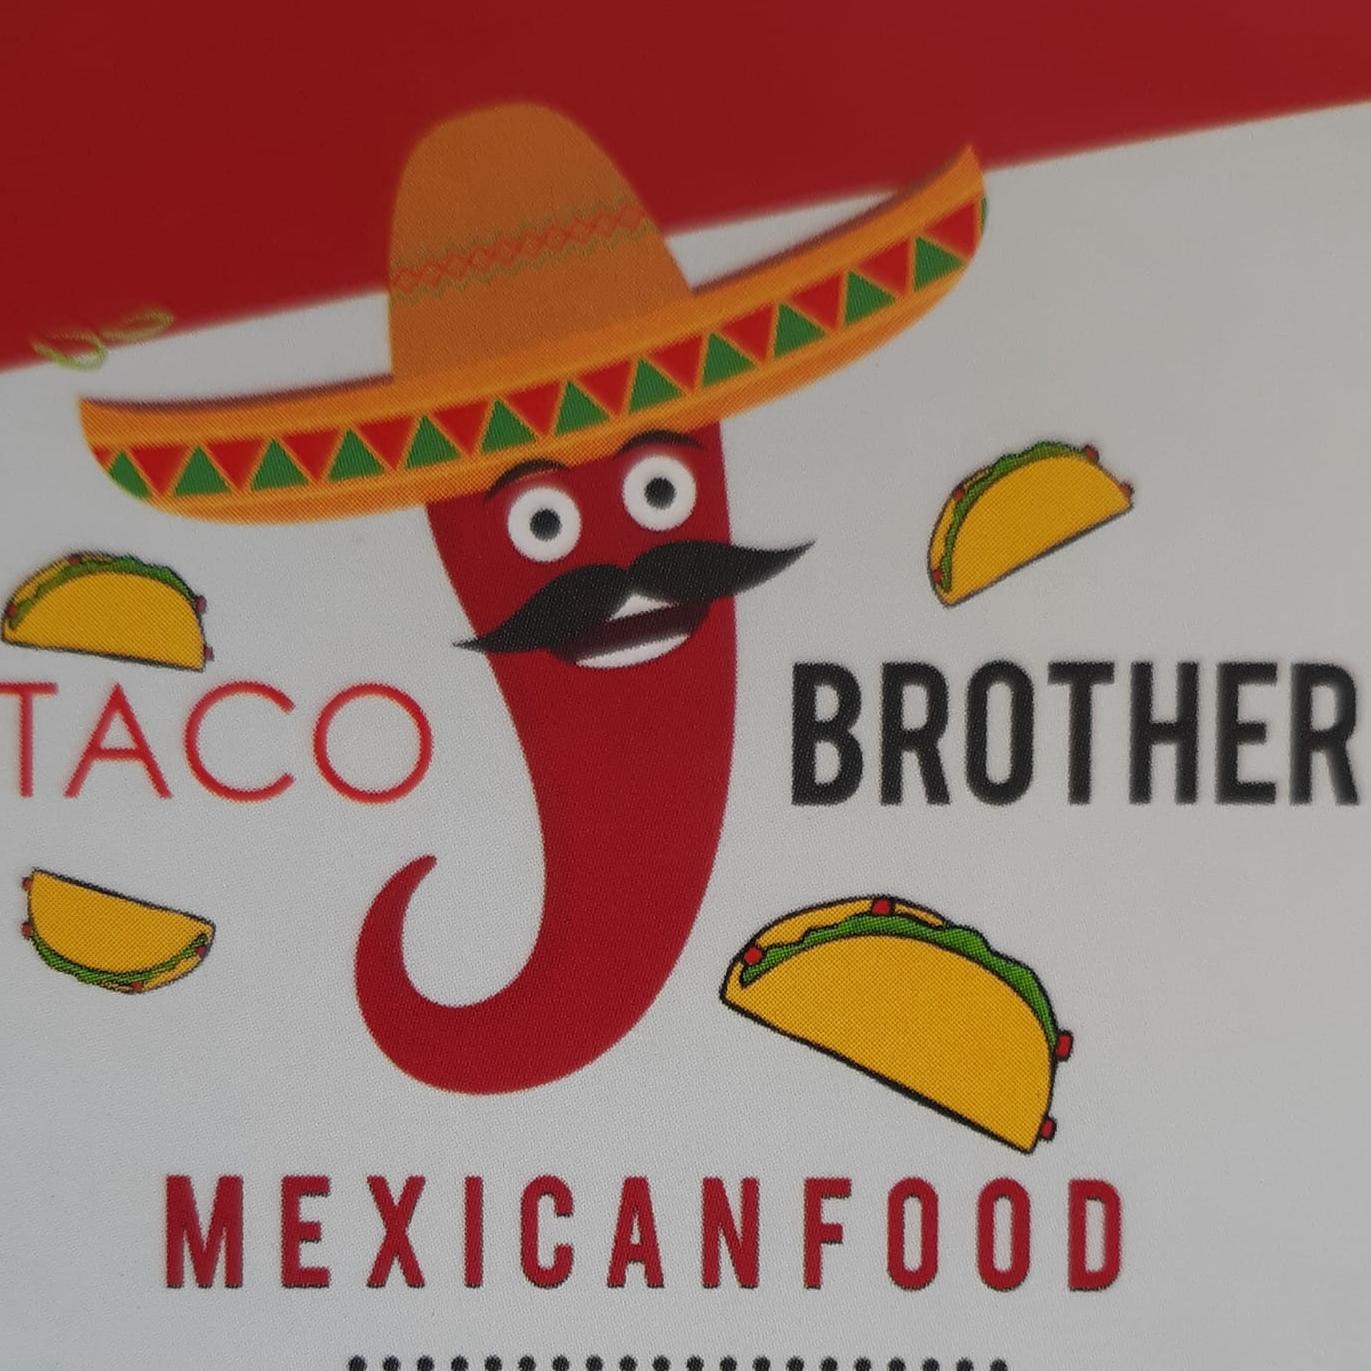 Taco Brother logo